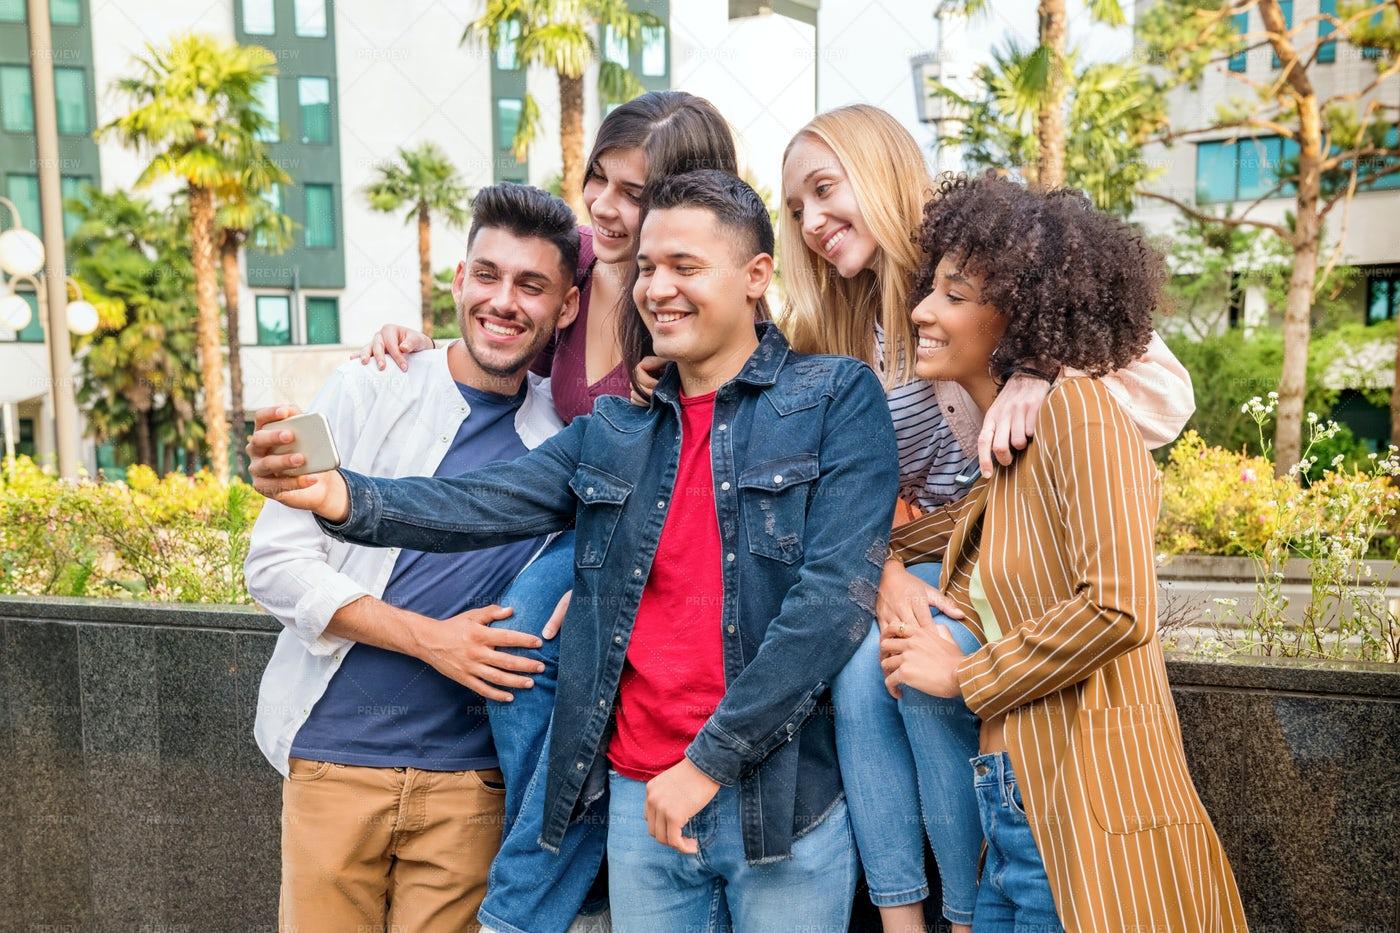 Happy Friends Taking Selfie: Stock Photos